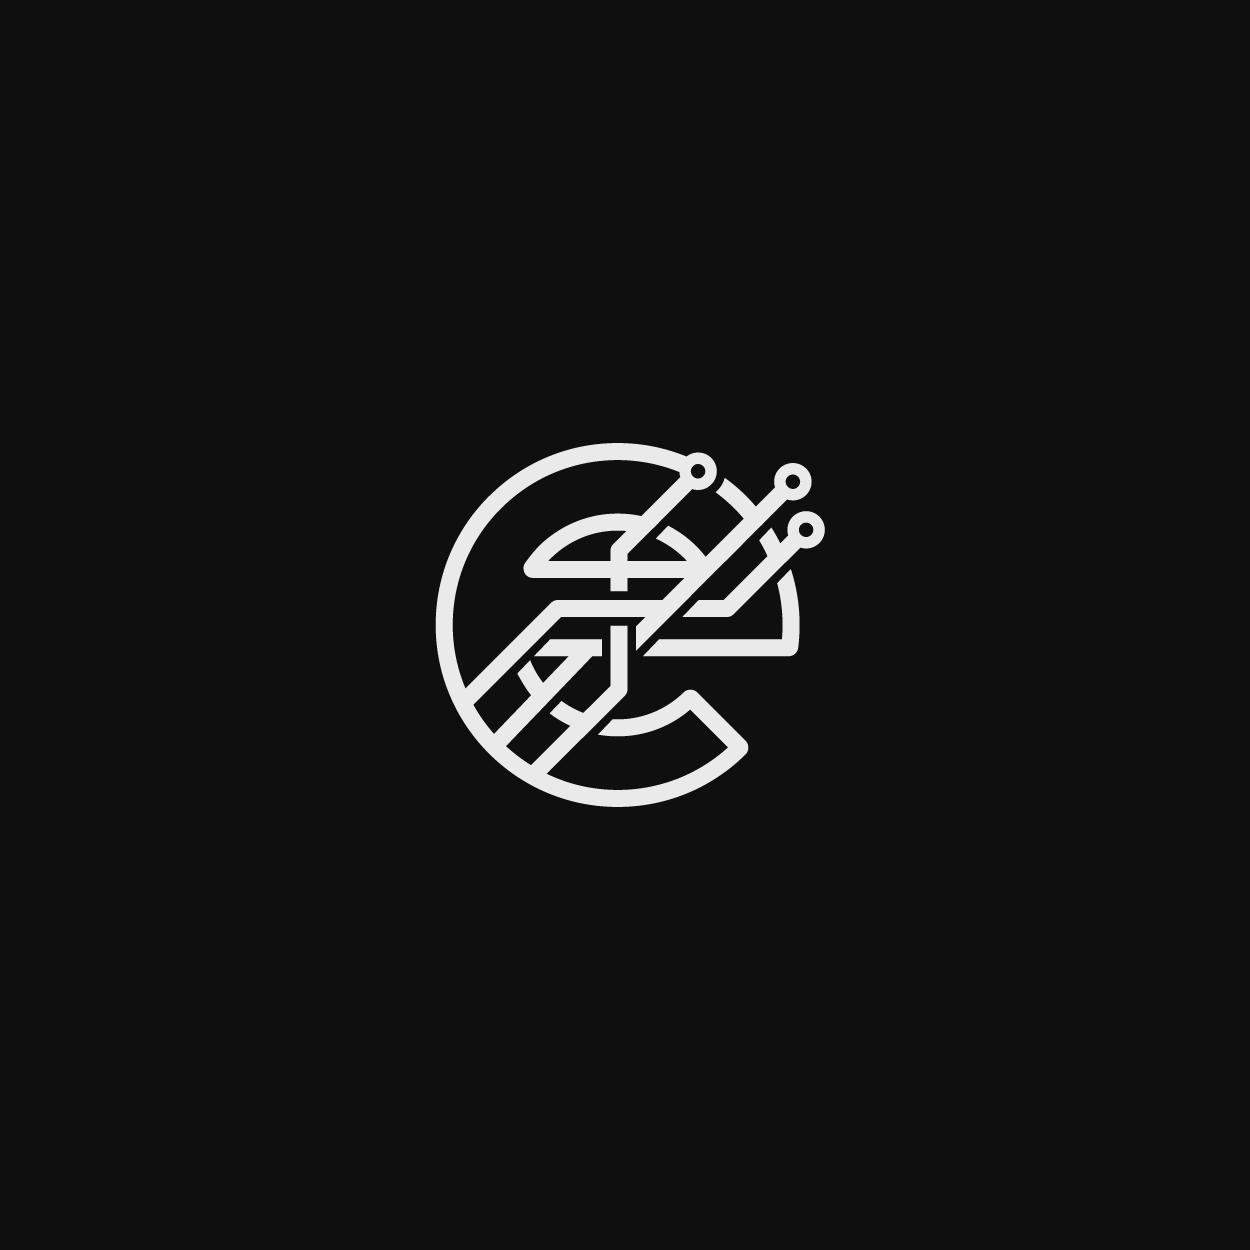 Sylvan_Logofolio2019_Artboard 121 copy1250.jpg